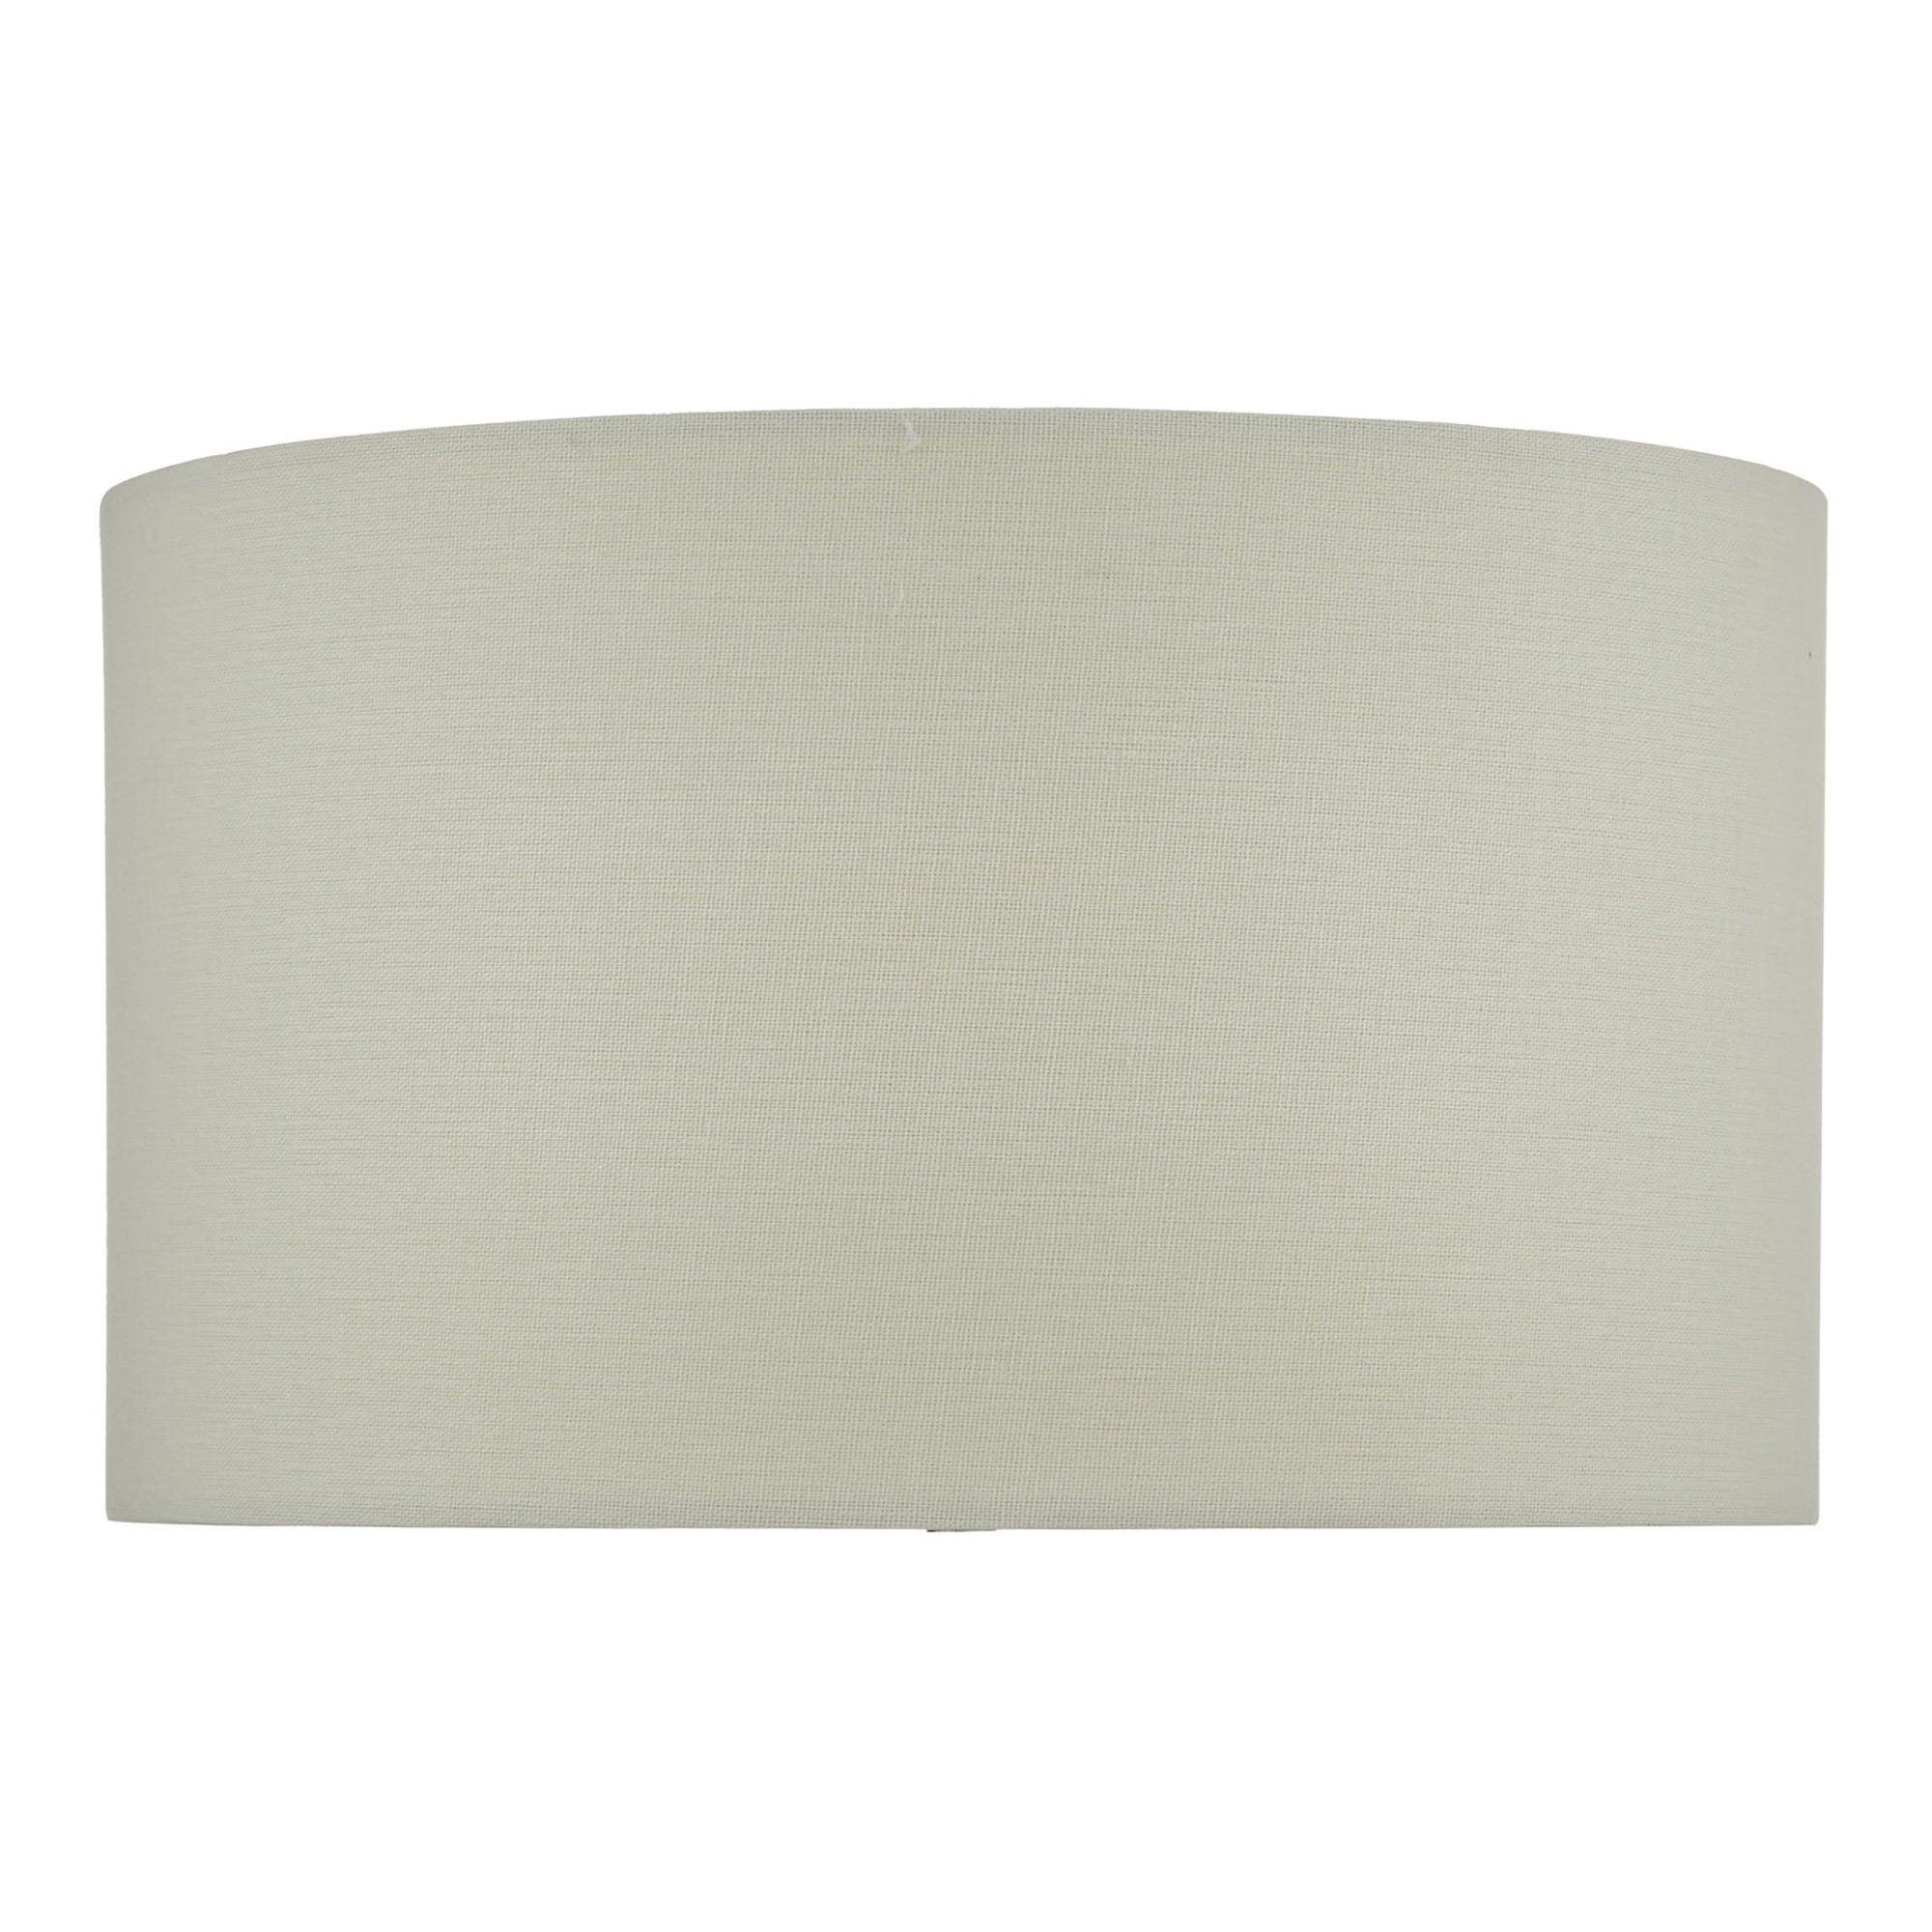 White Linen Drum Lamp Shade Lighting, Lamp Shade White Linen Drum